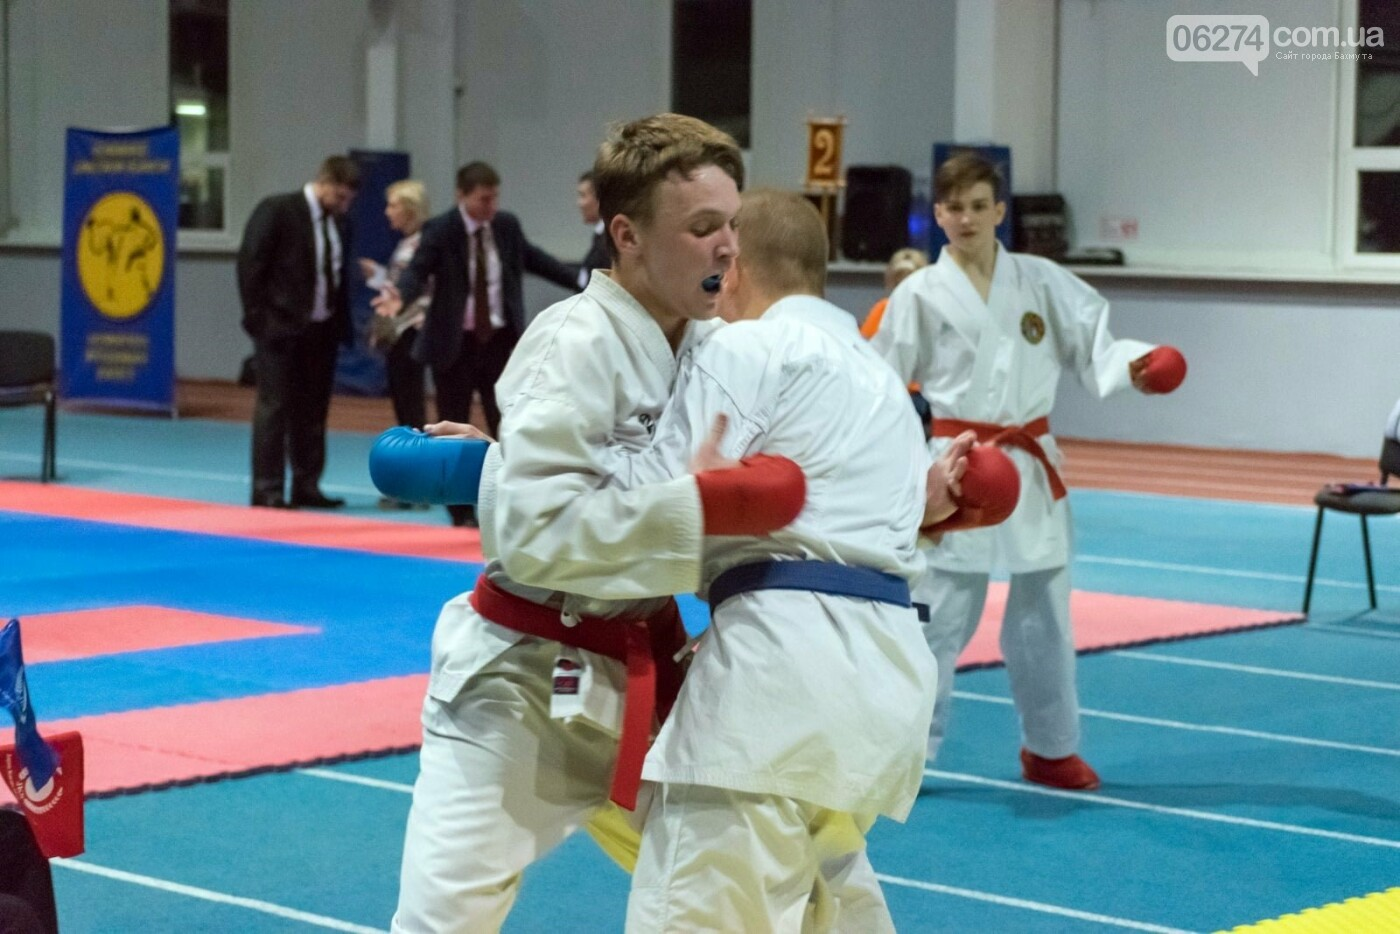 Бахмут принял чемпионат Донецкой области по каратэ JKS, фото-1